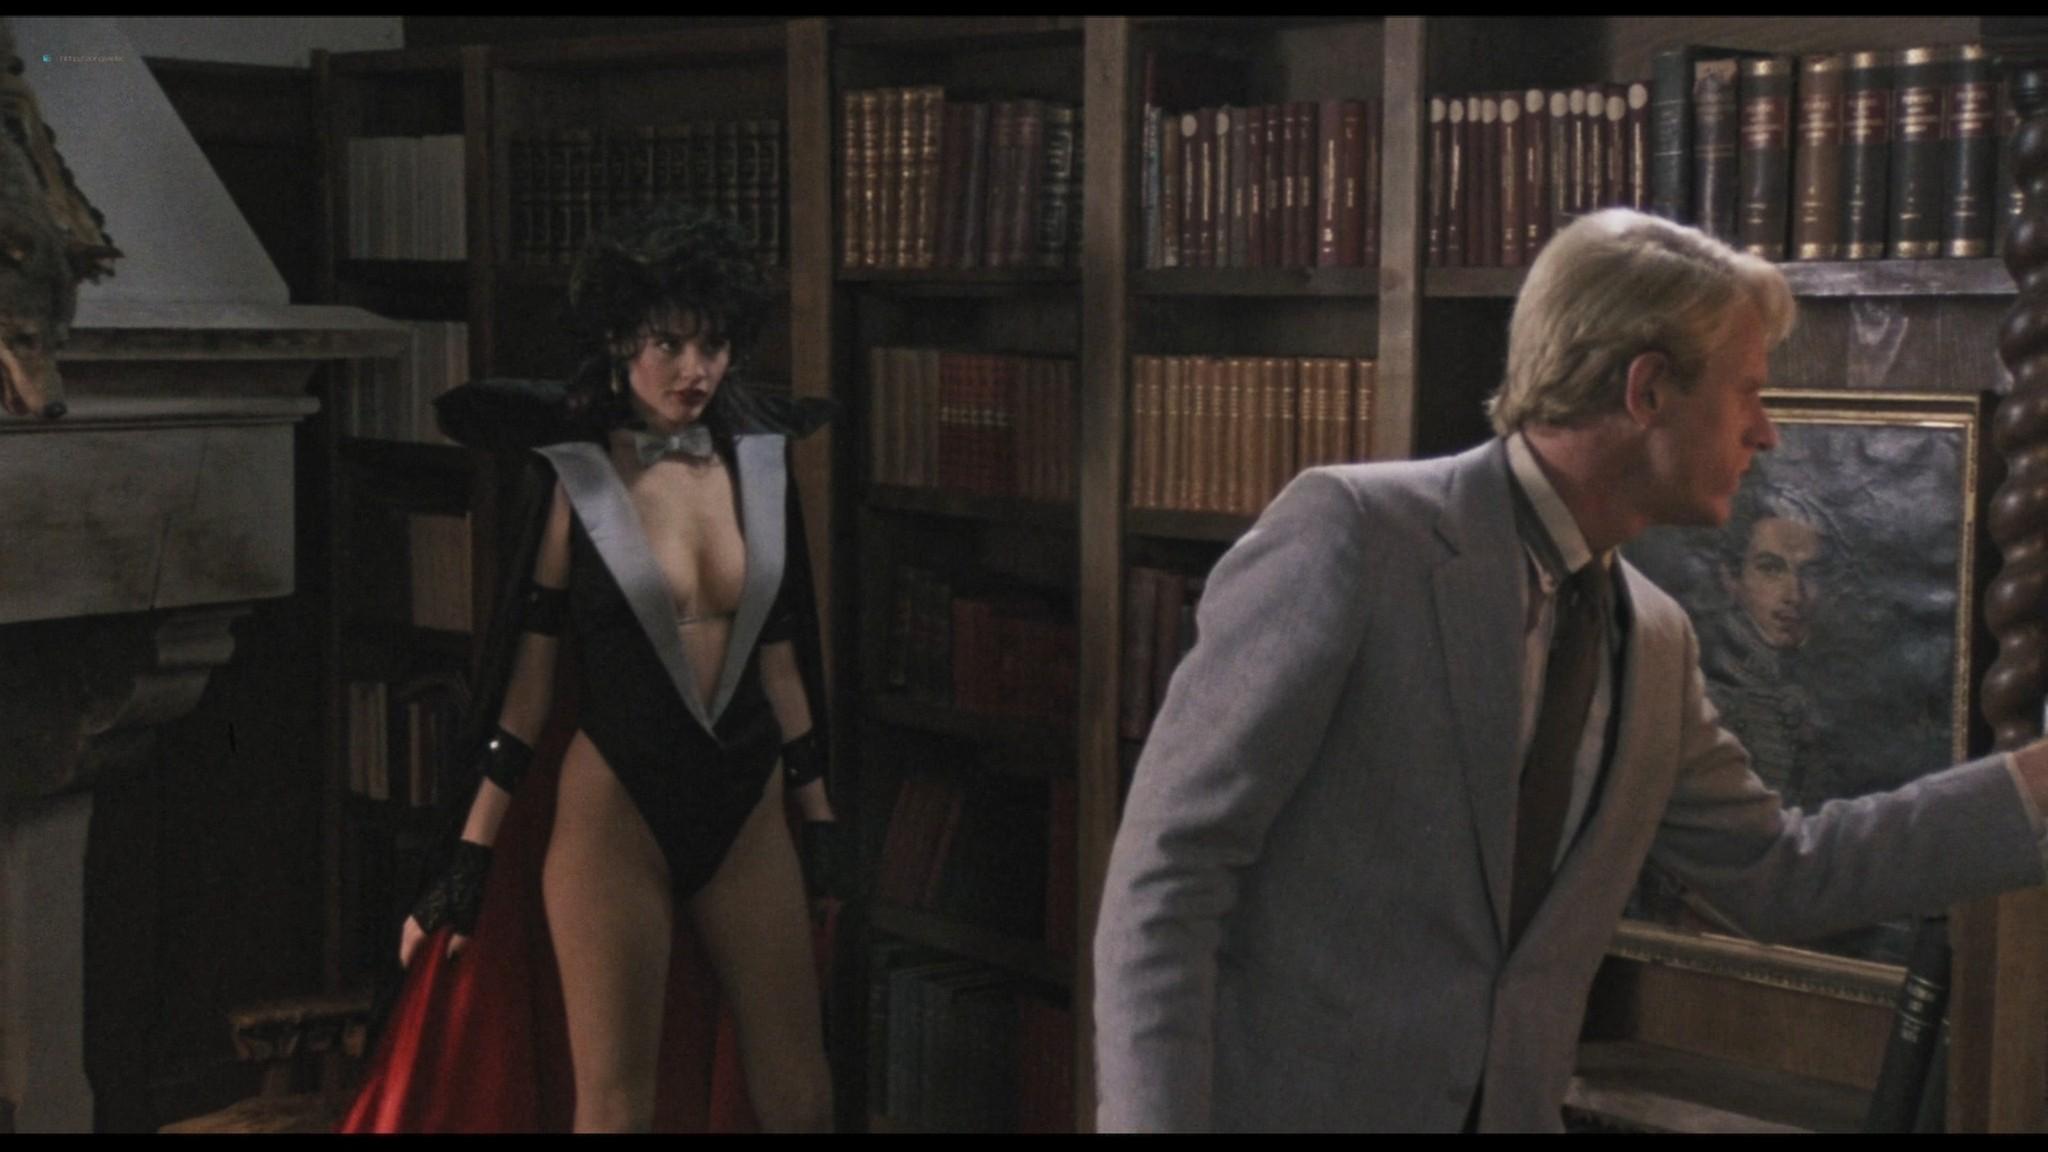 Geena Davis hot and sexy Ksenia Prohaska sexy - Transylvania 6-5000 (1985) HD 1080p BluRay (16)